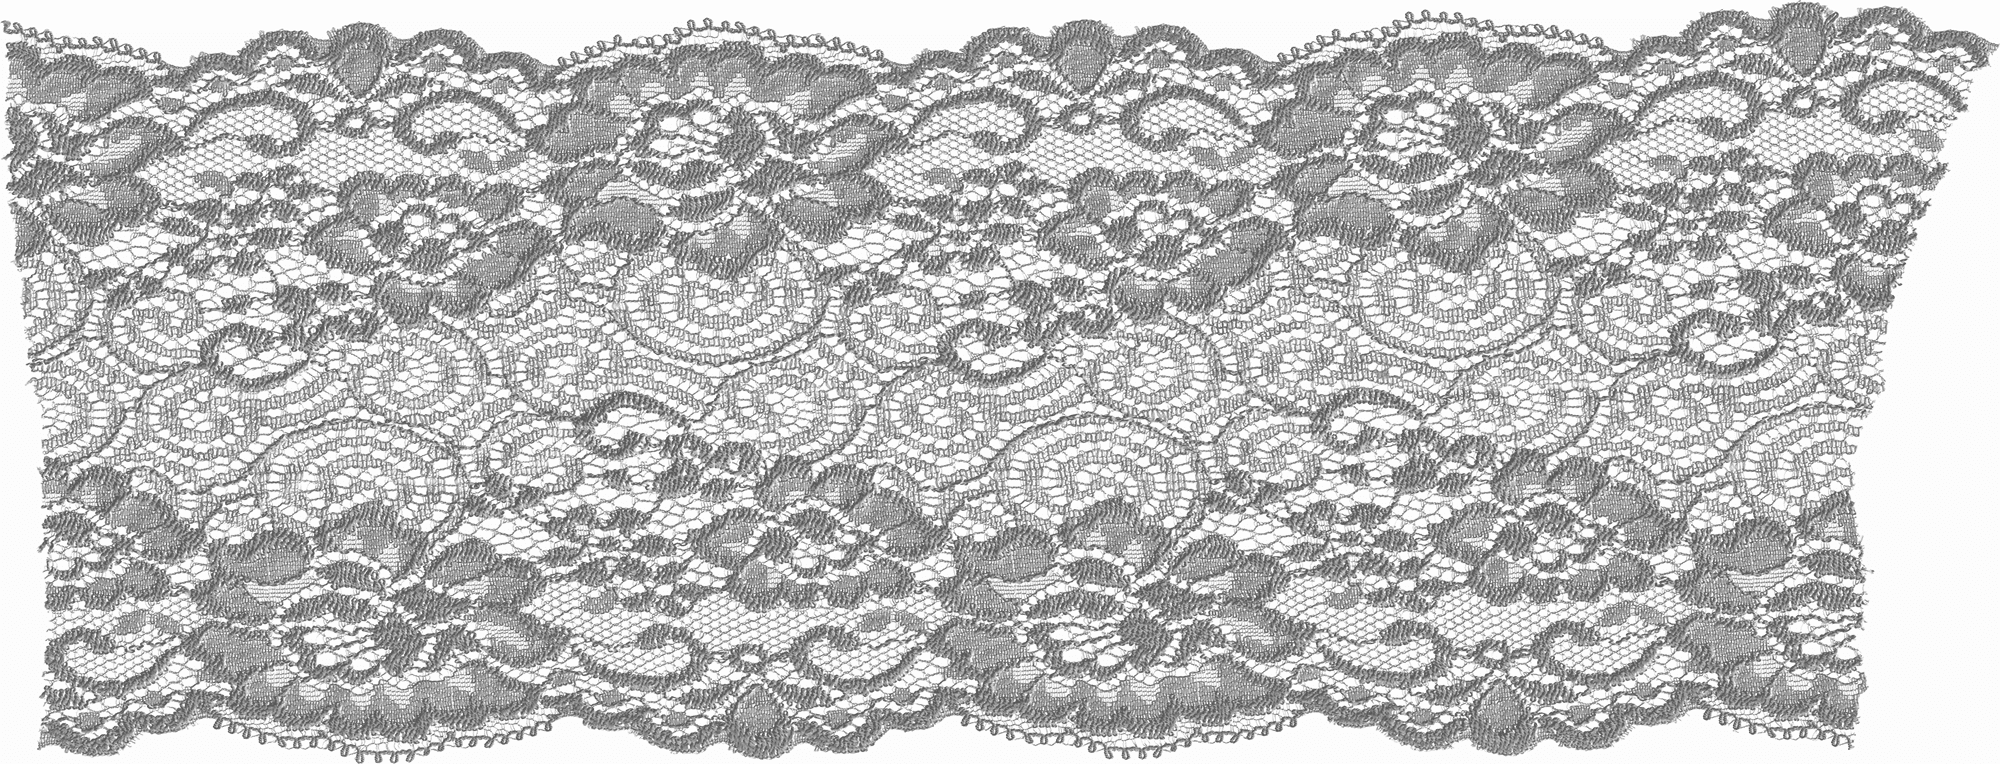 jcb danceworks,jcb danceworks competitive,jcb danceworks comptetitive dance,join competitive dance,dance competitions,competitive dancer,competitive dance routines,hip hop,lyrical,ballet,contemporary,tap,acro,jazz,competitive dance auditions,competitive dance auditions richmond hill,full time competitive dance,part time competitive dance,competitive dance team,competitive dance team richmond hill,competitive dance team vaughan,competitive dance,competitive dance in richmond hill,competitive dance in vaughan,competitive dance in maple,competitive dance near me,competitive dance in thornhill,competitive dance program,competitive dance programs